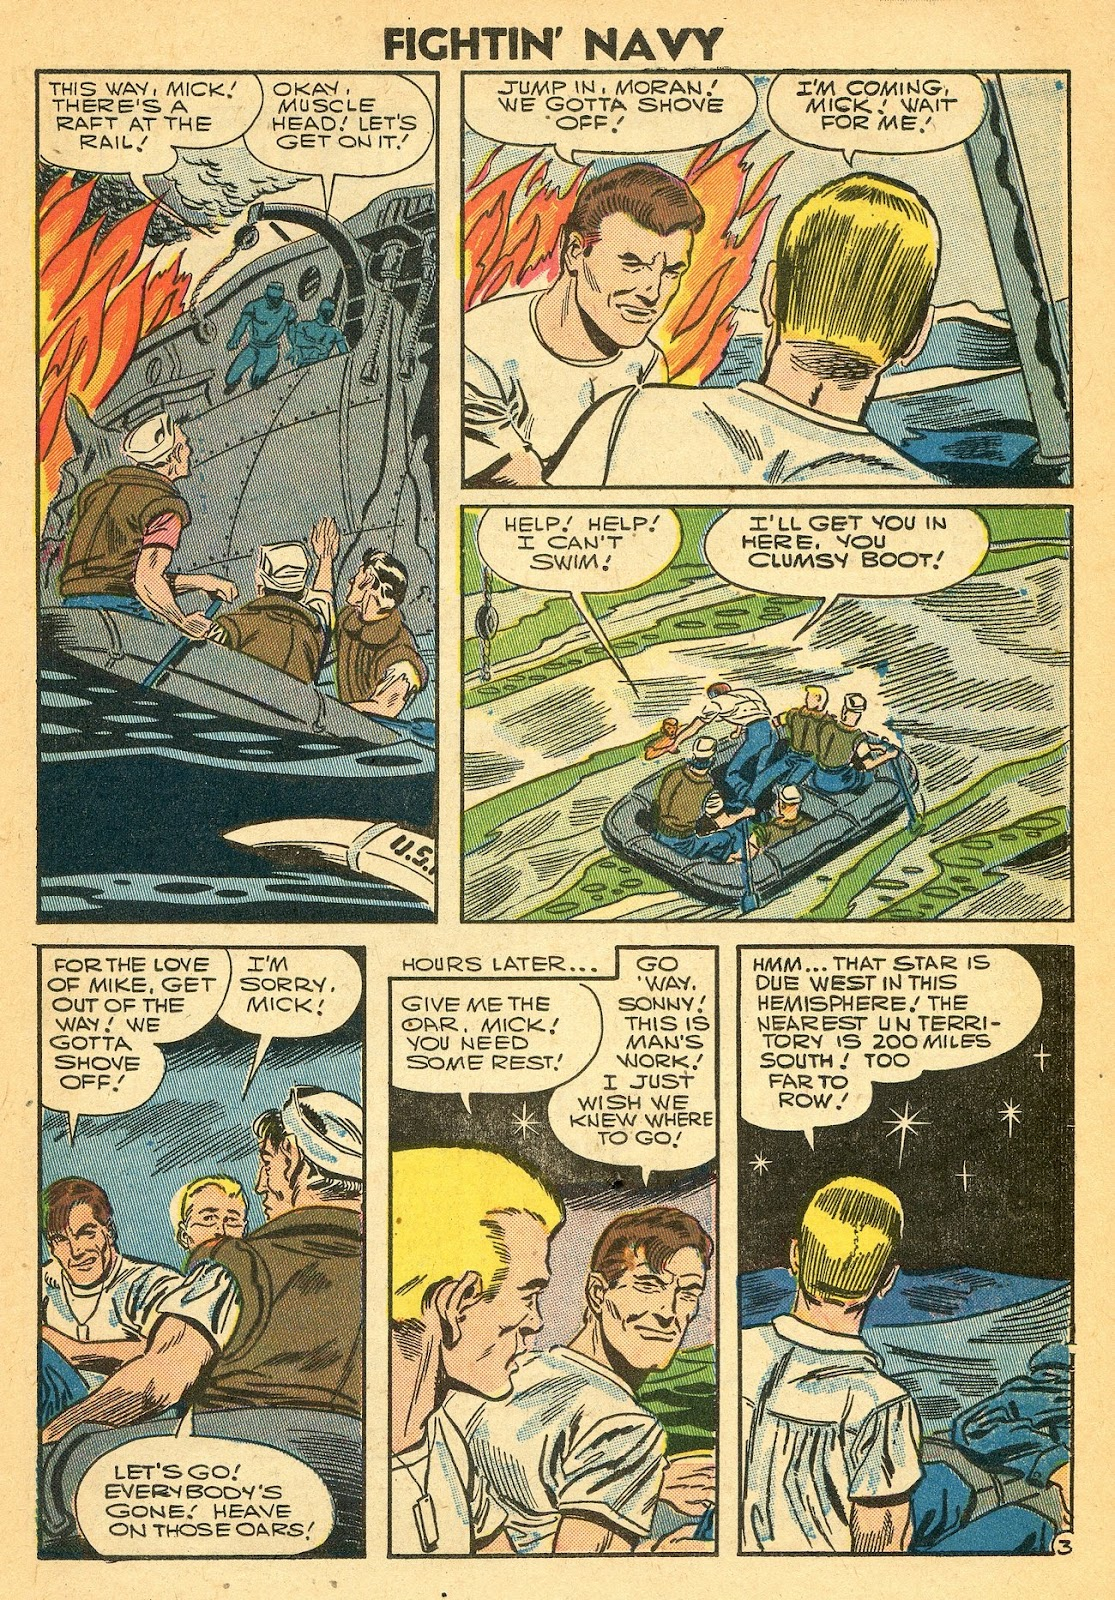 Read online Fightin' Navy comic -  Issue #77 - 21